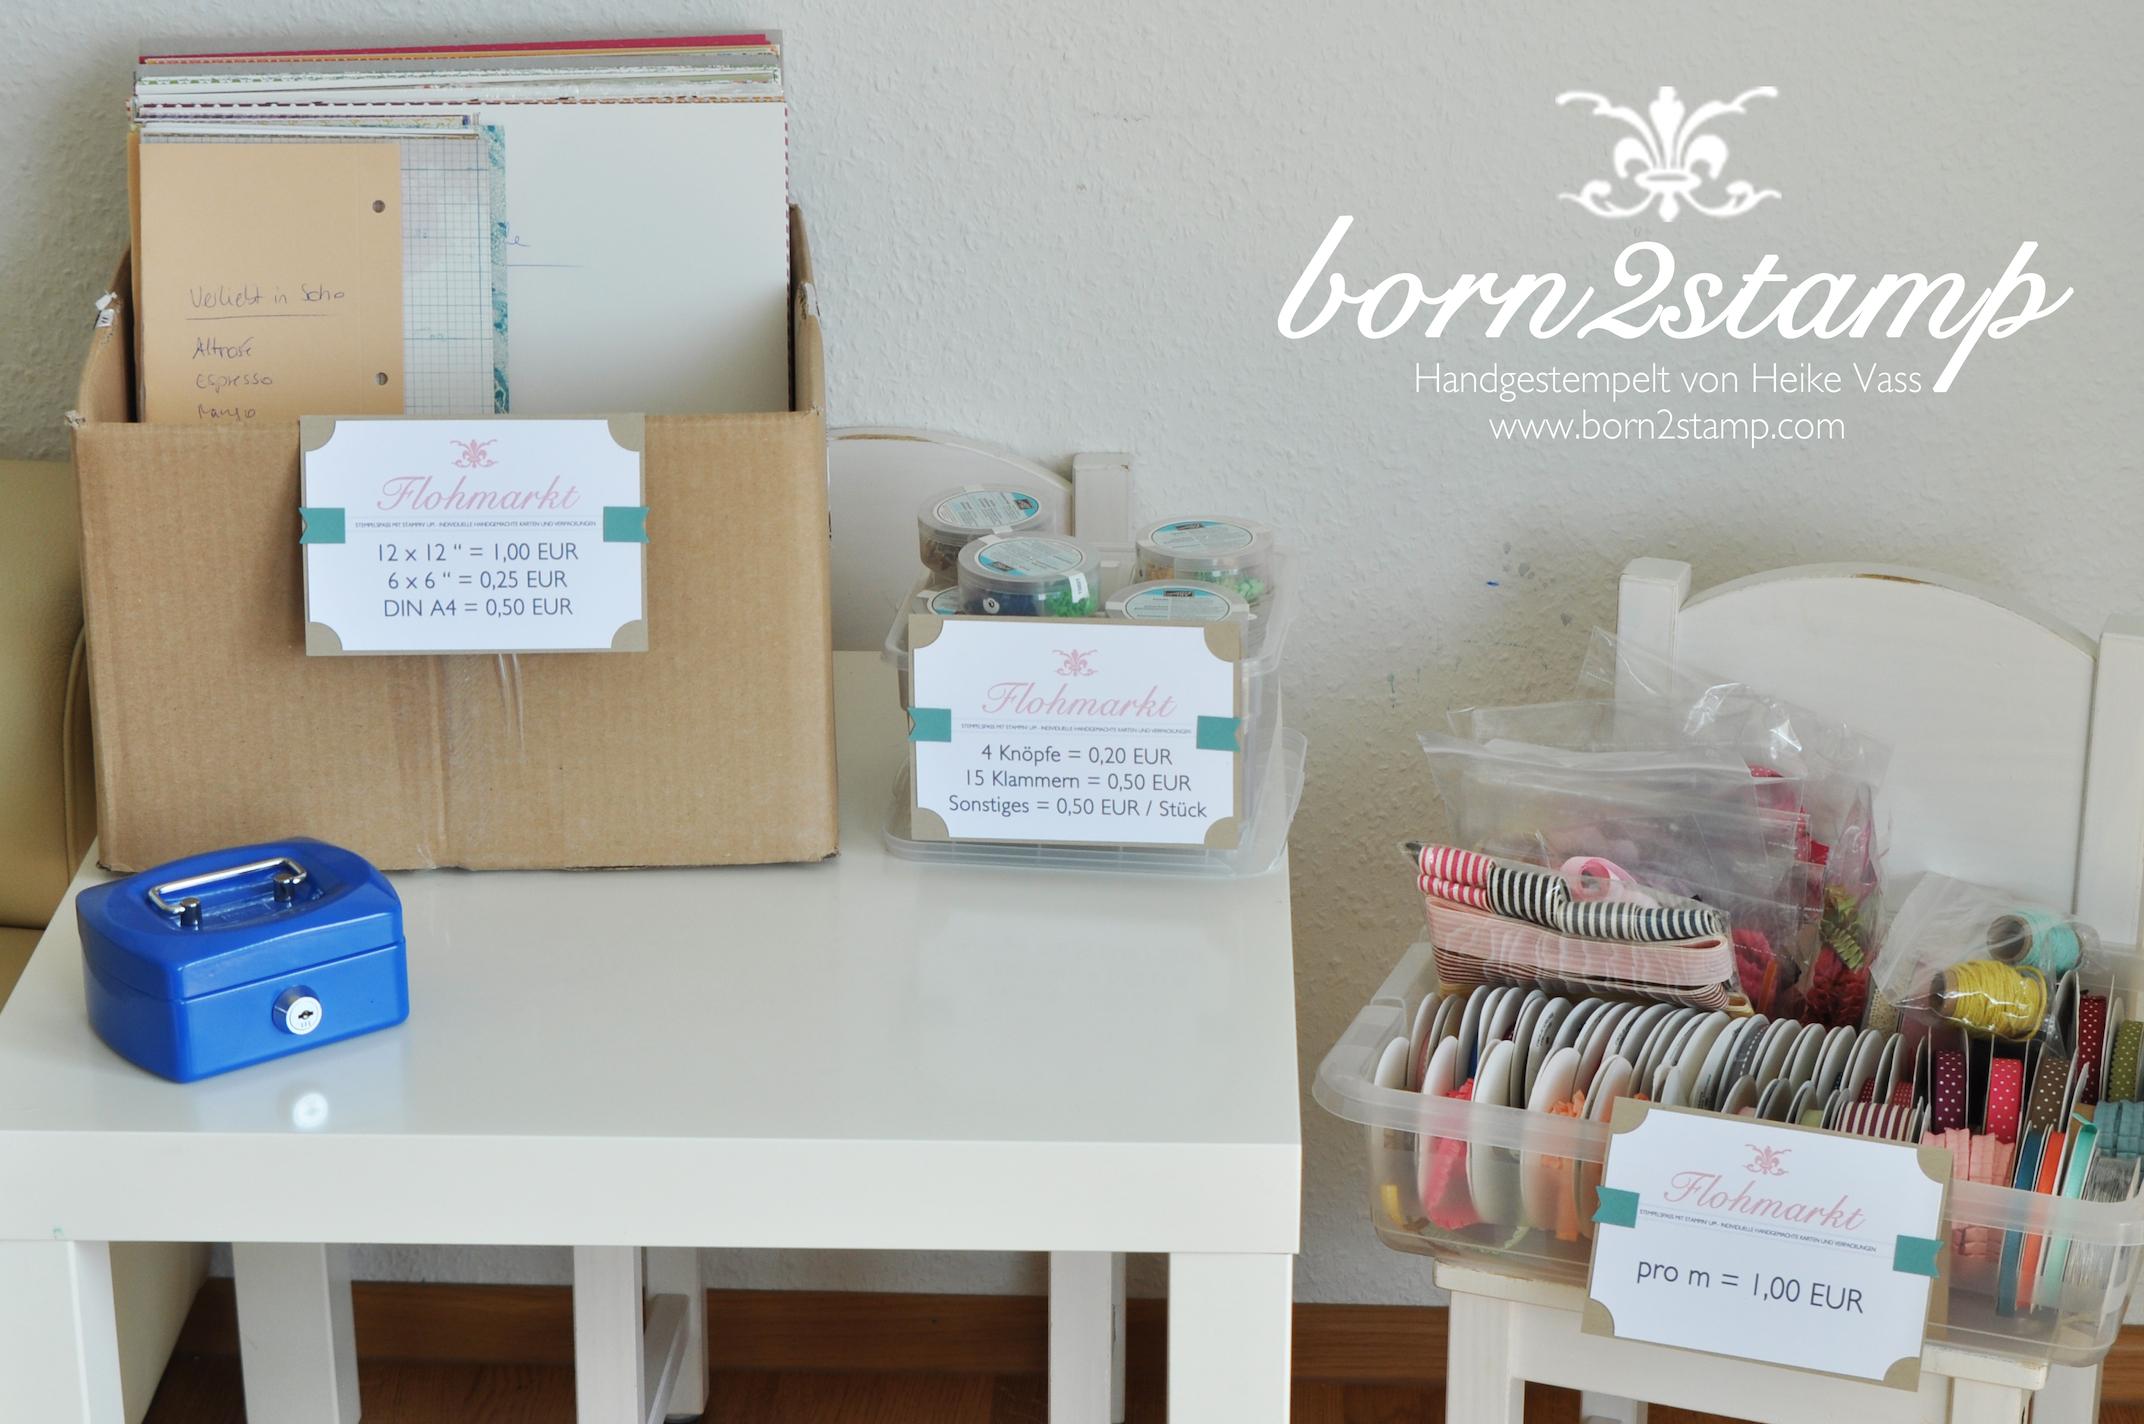 Katalogparty born2stamp Flohmarkt